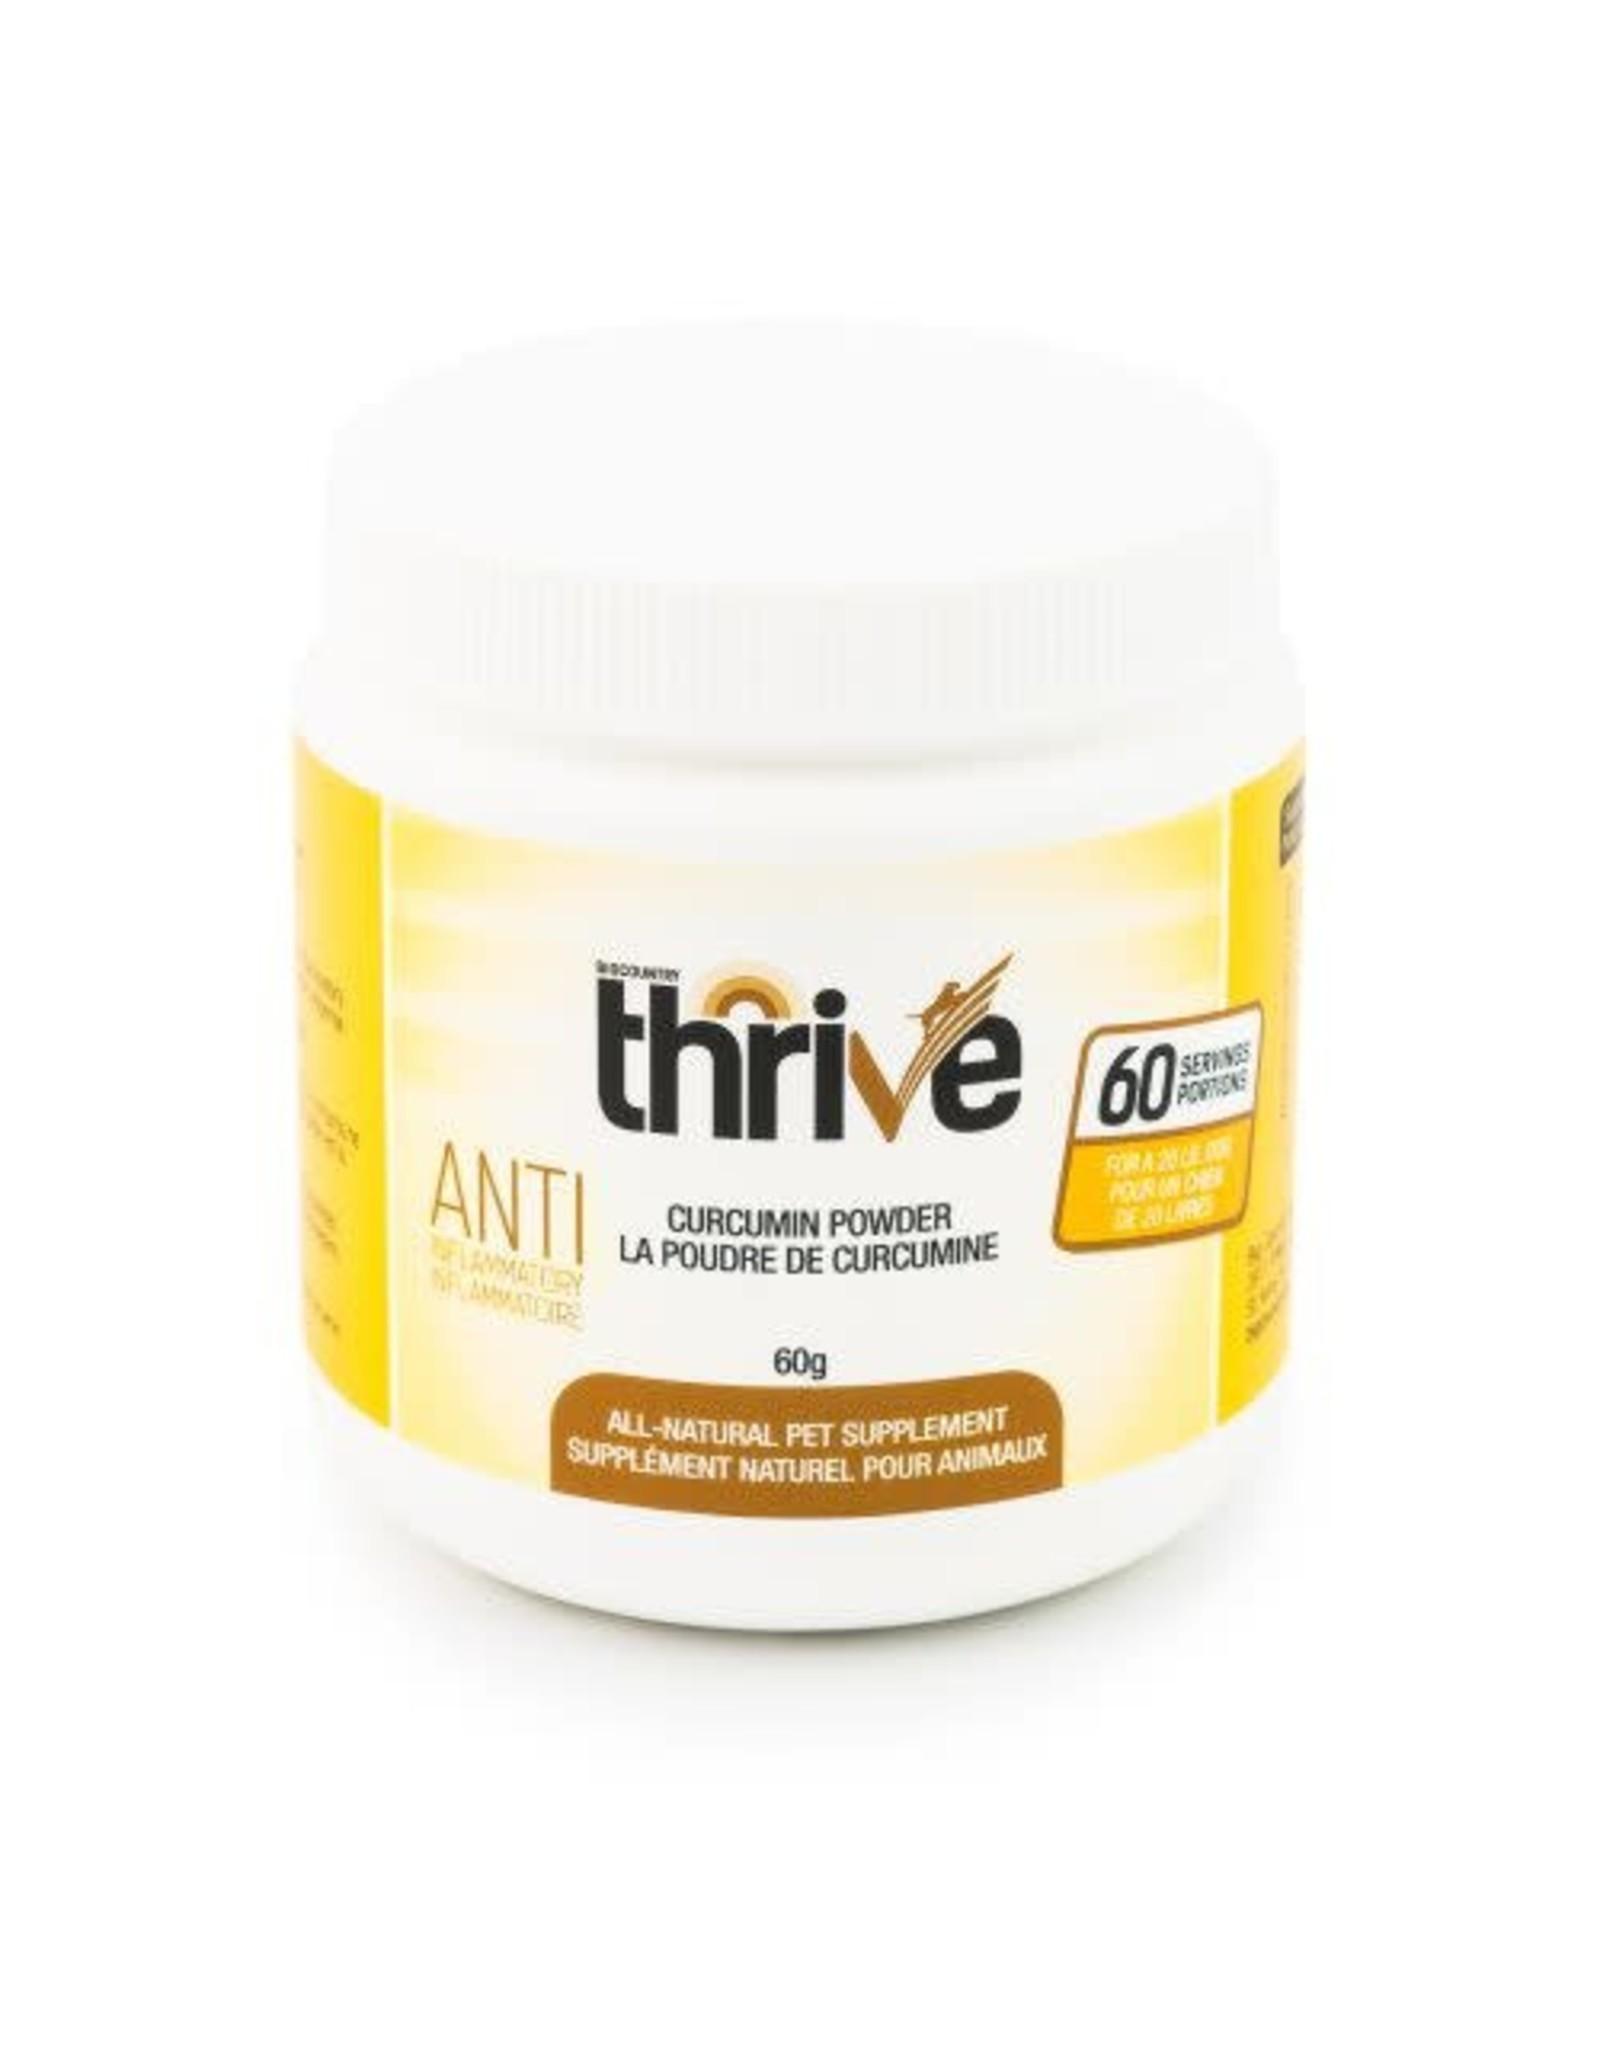 Thrive Curcumin Powder - 60g